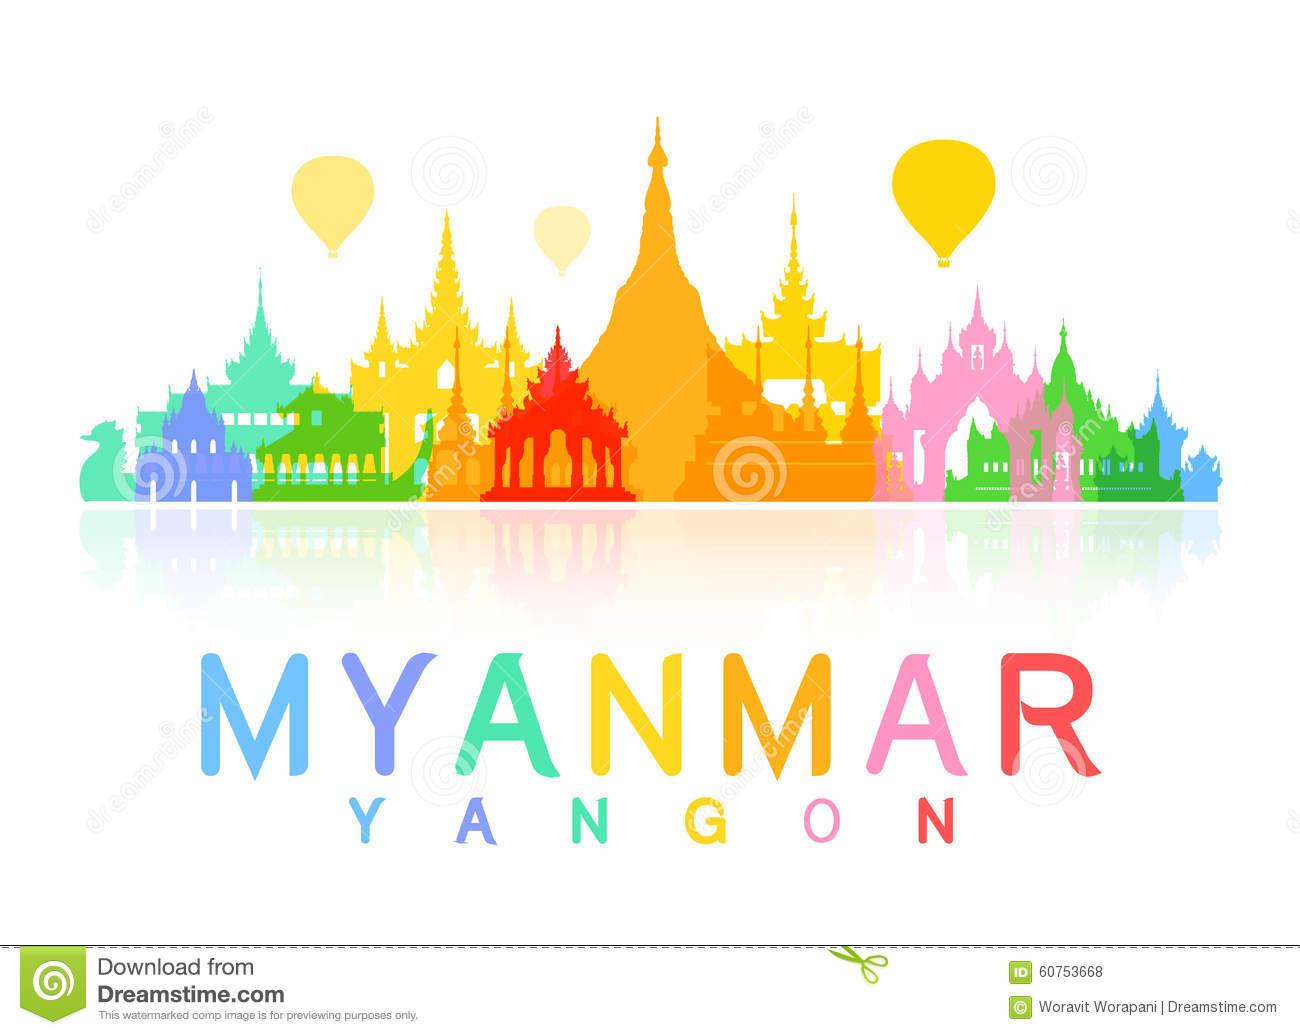 Yangon clipart - Clipground